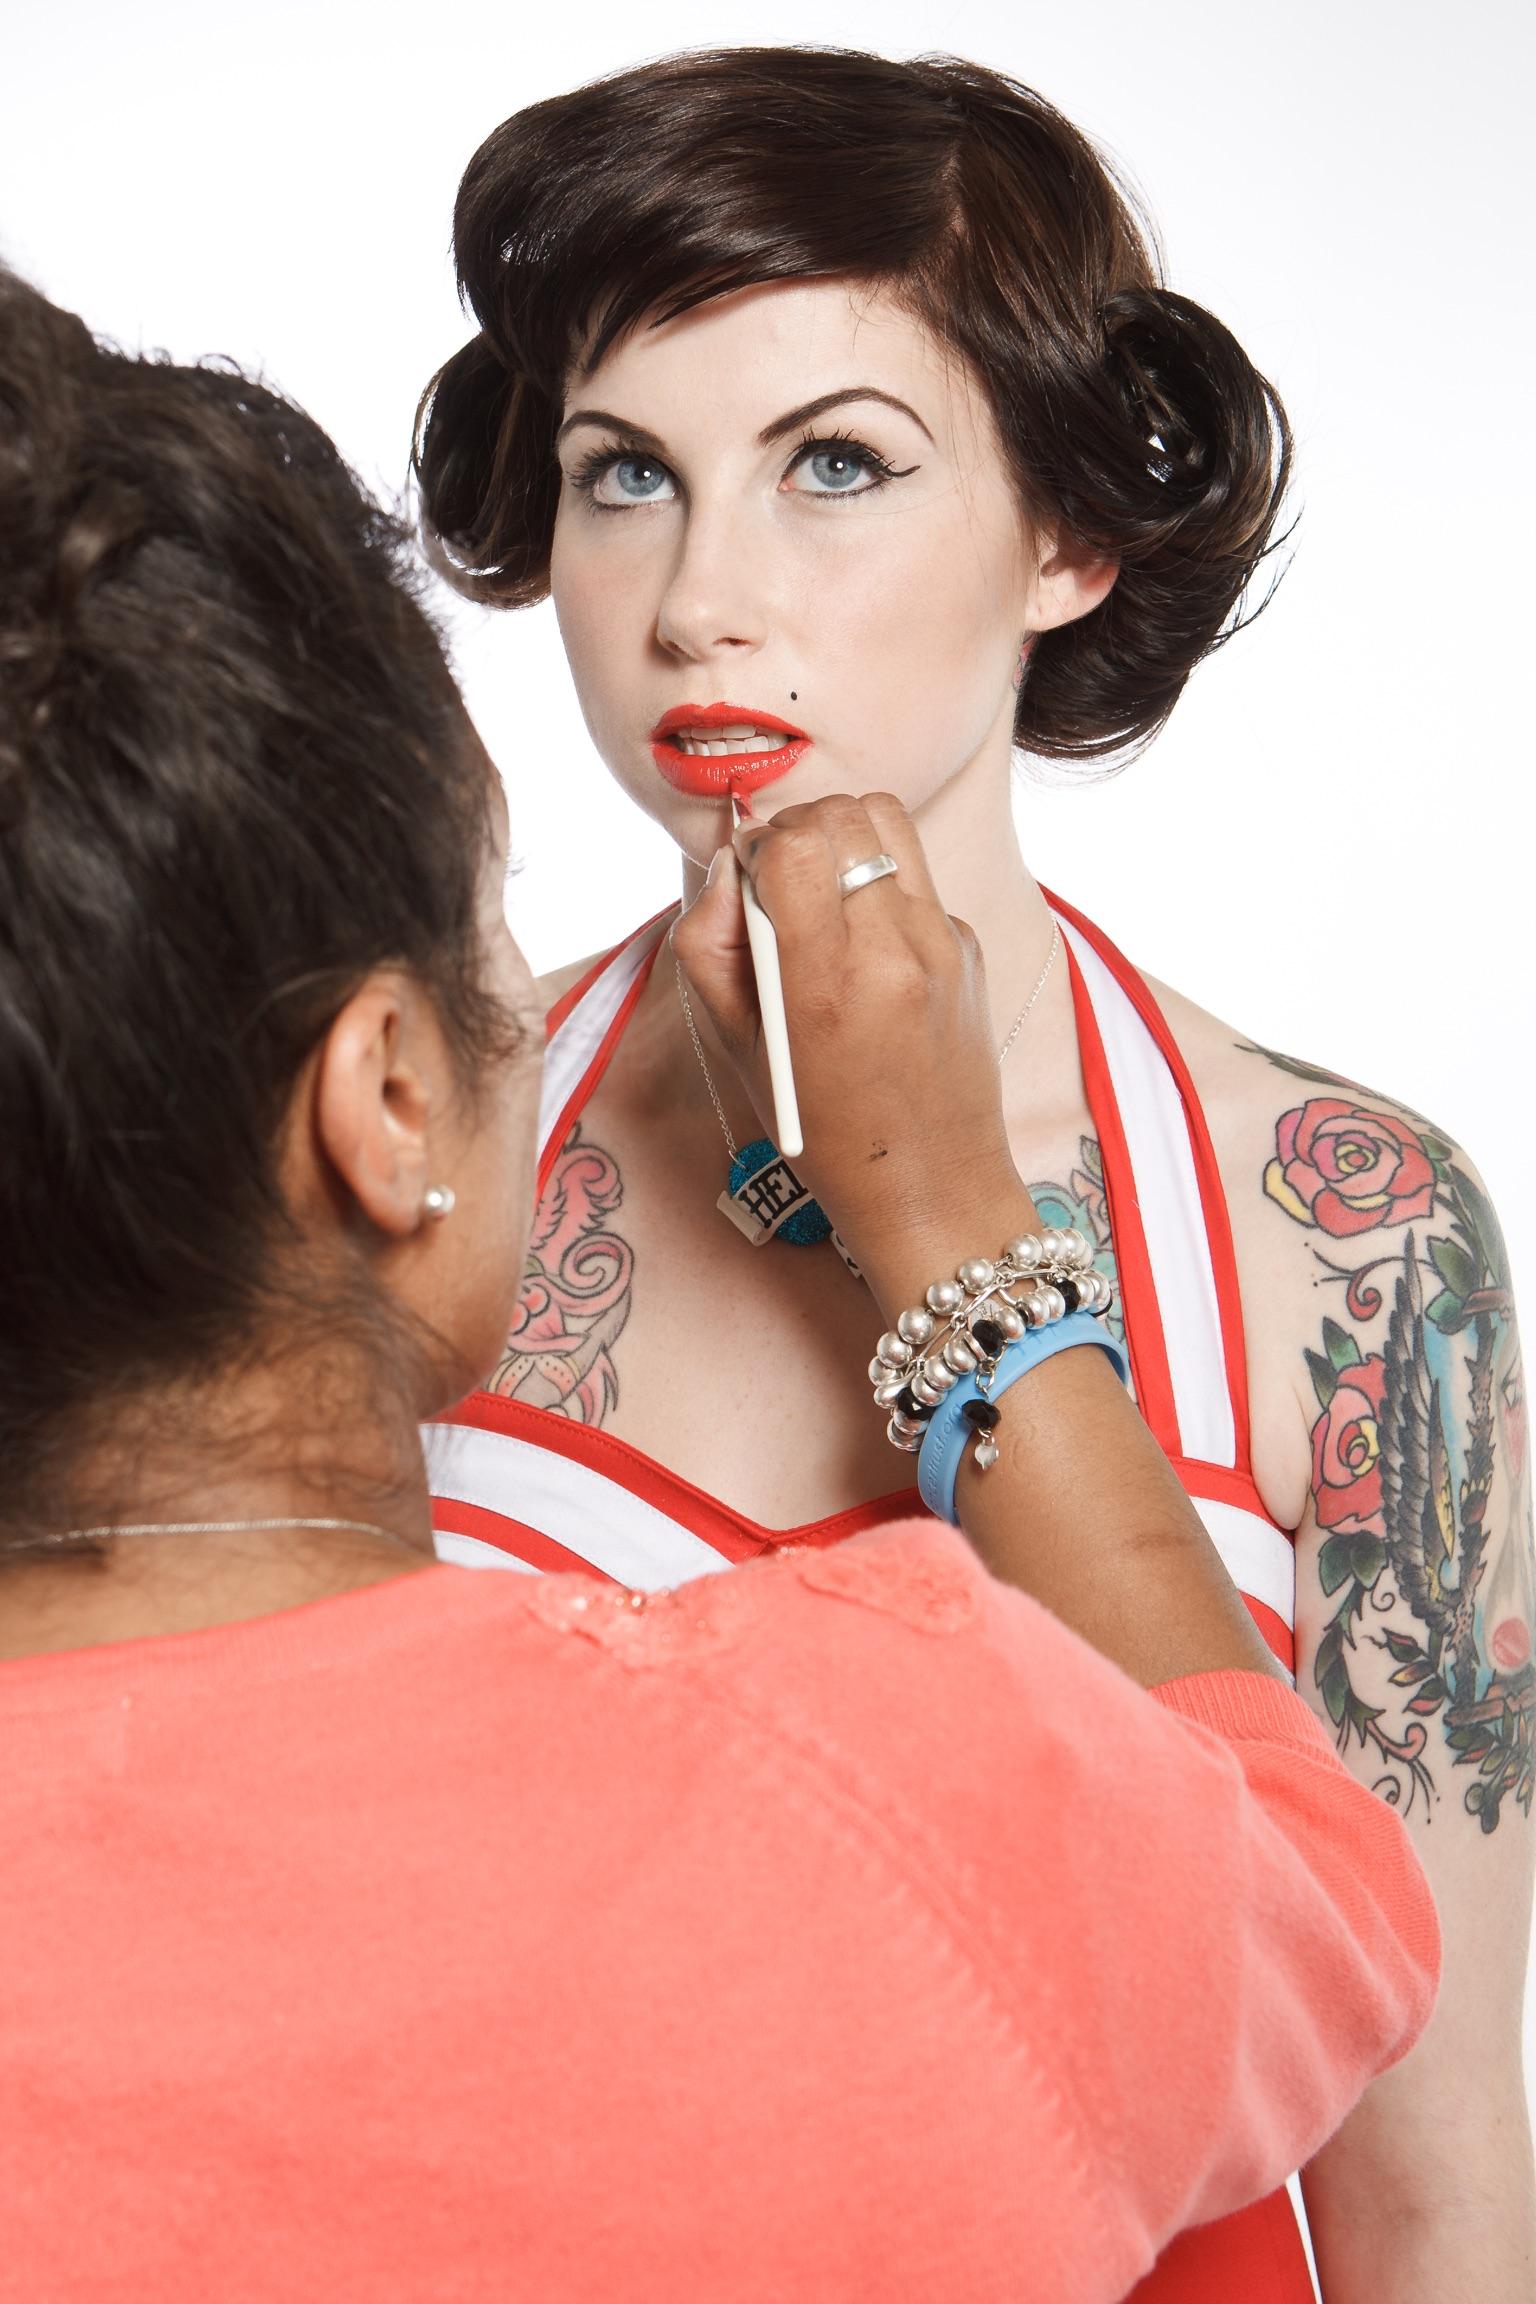 Skin-deep Magazine Hollie Bryant BTS Behind the Scenes Make-up Makeup Tattoos Photoshoot Planning Workflow